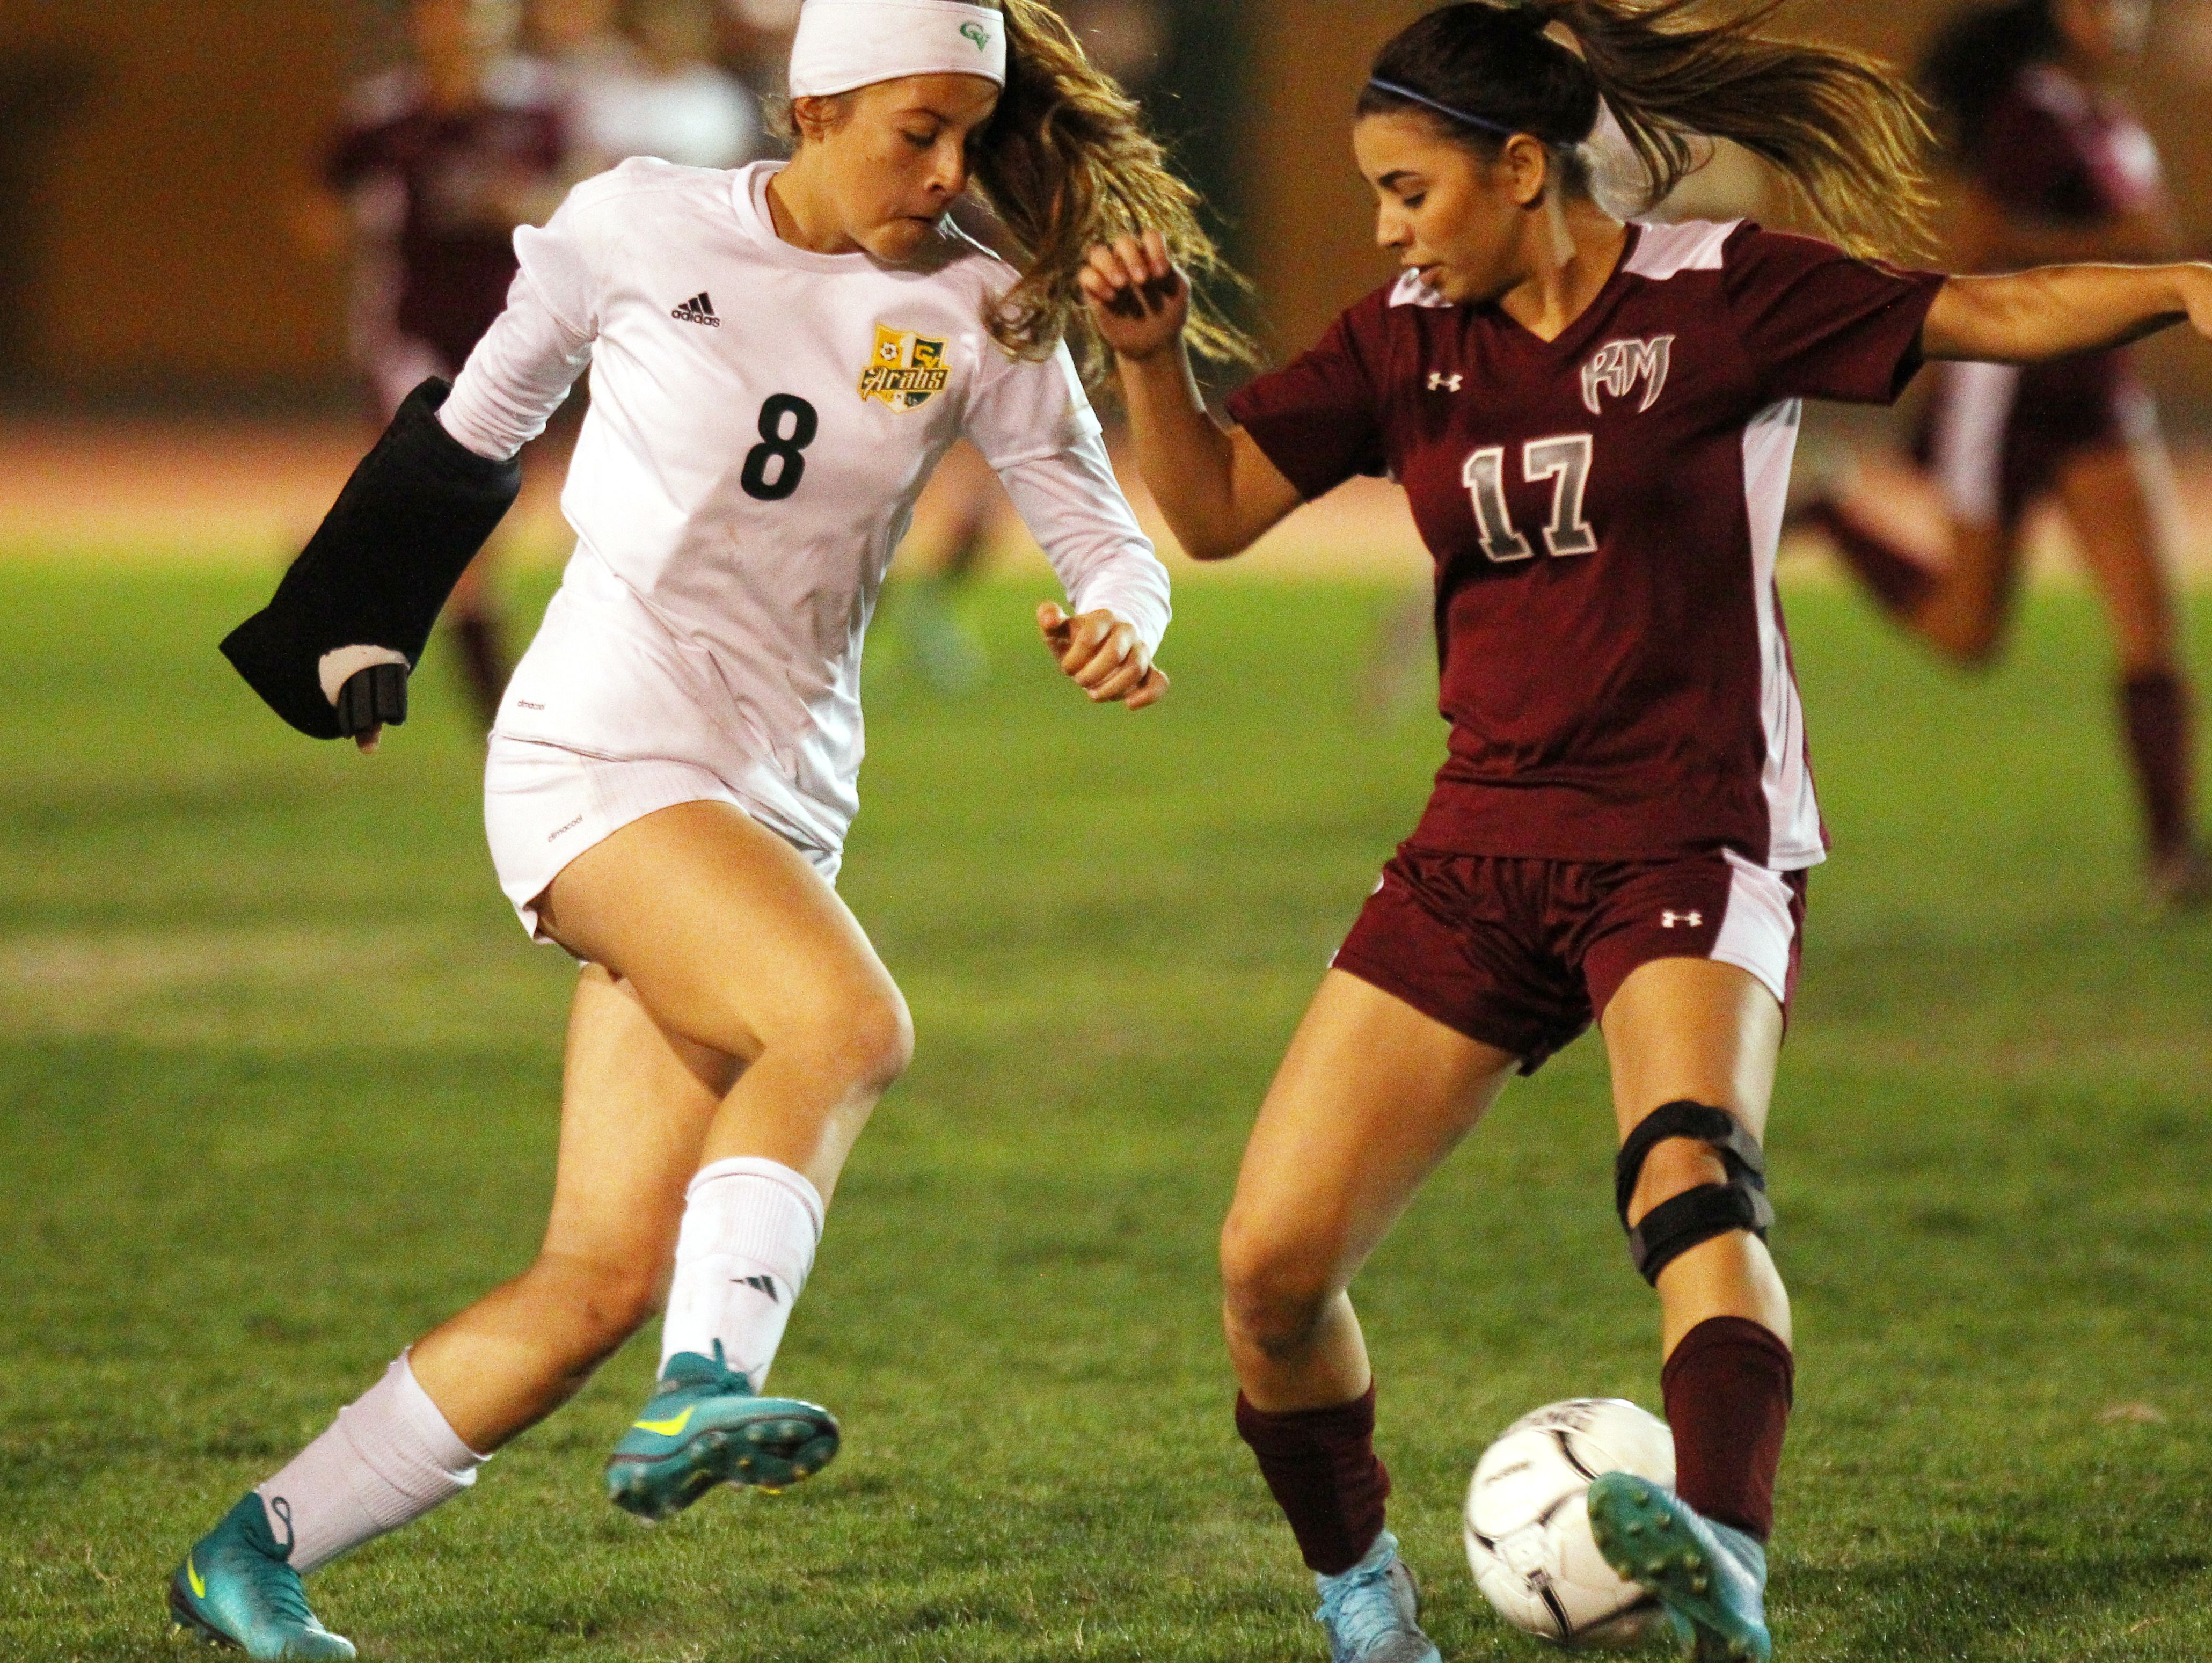 Rancho Mirage's Daniela Jimenez tries to stop Coachella Valley High School's Miranda Torres during their championship De Anza League in Thermal on February 7, 2017. Coachella won 2-0.